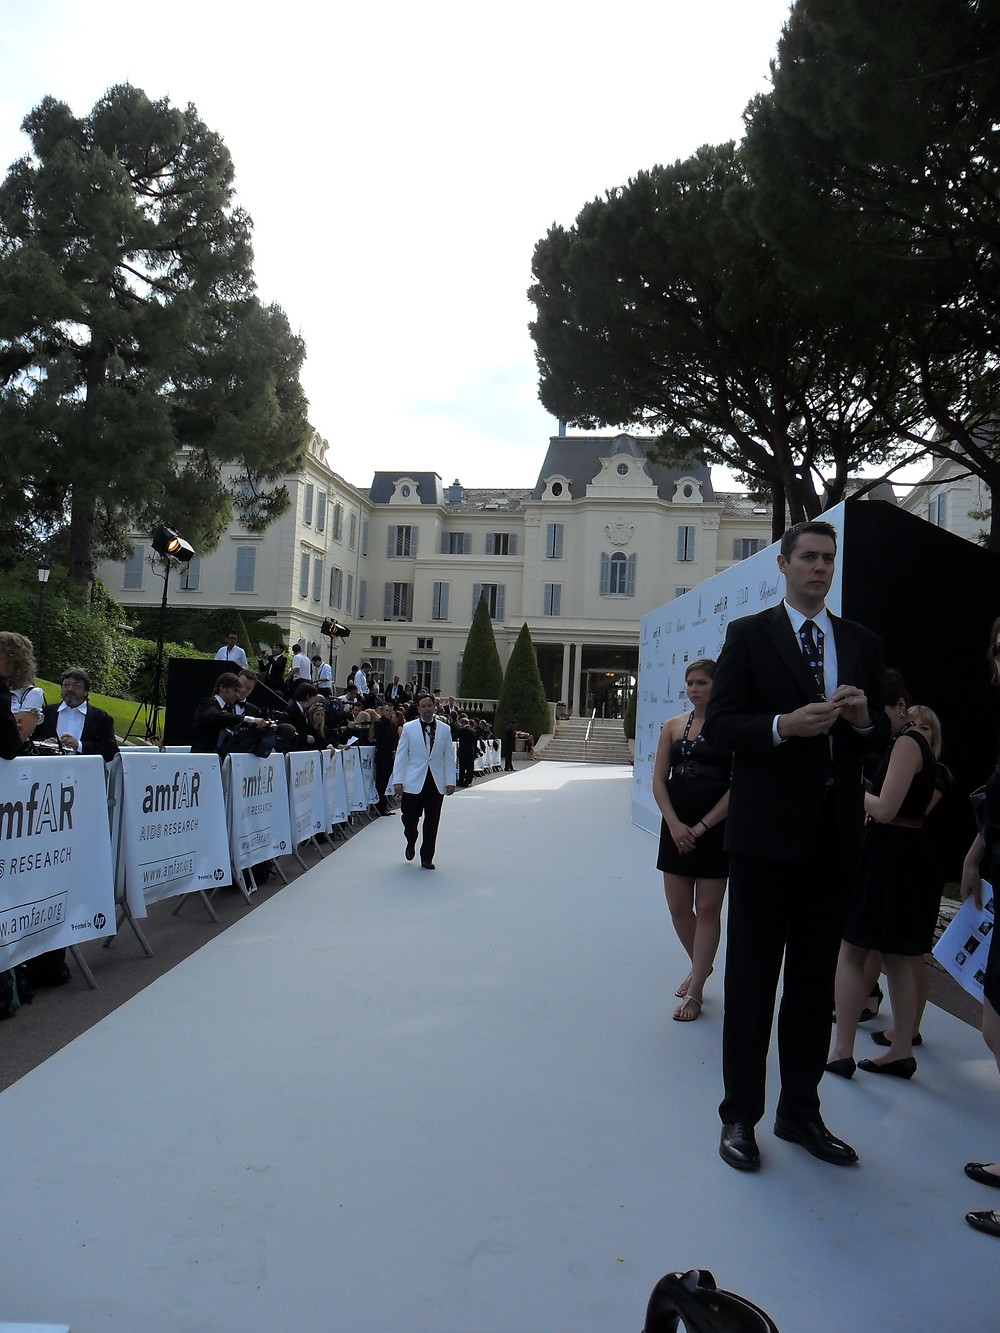 Hotel du Cap Eden Roc entrance of the AmfAR Gala